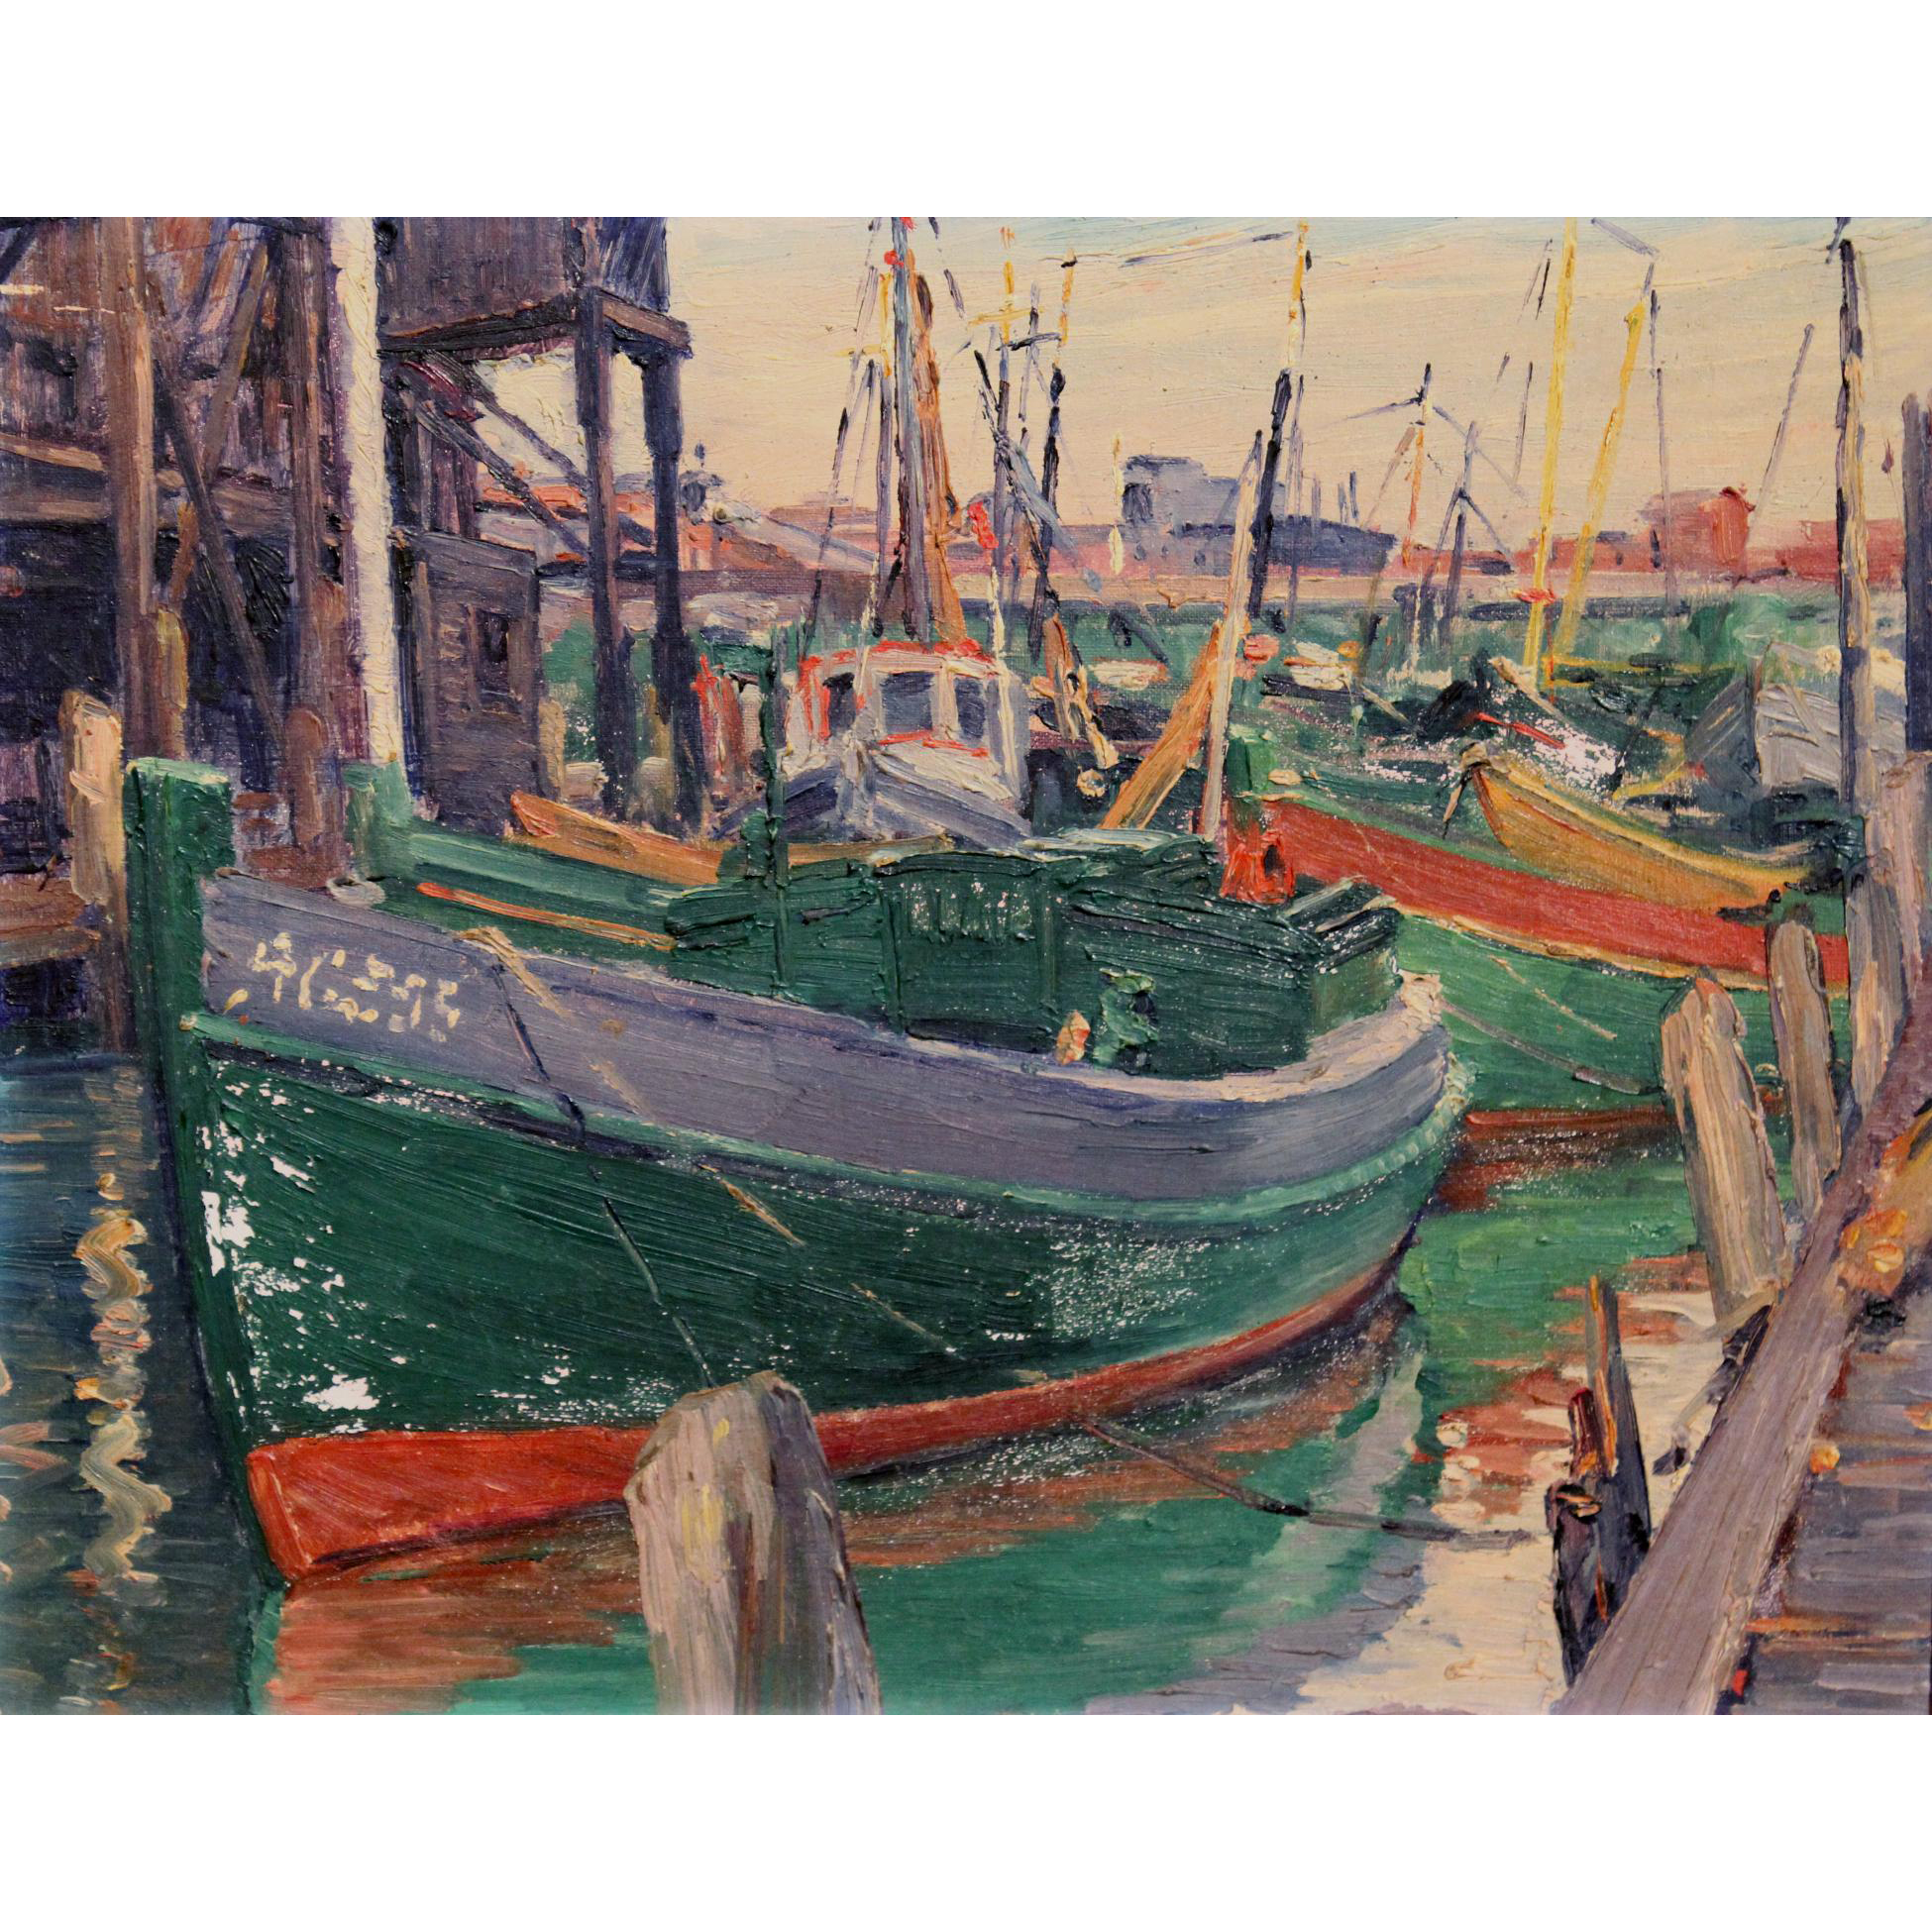 William Malherbe Marine Oil Painting of a Harbor Scene -  Gloucester, Mass